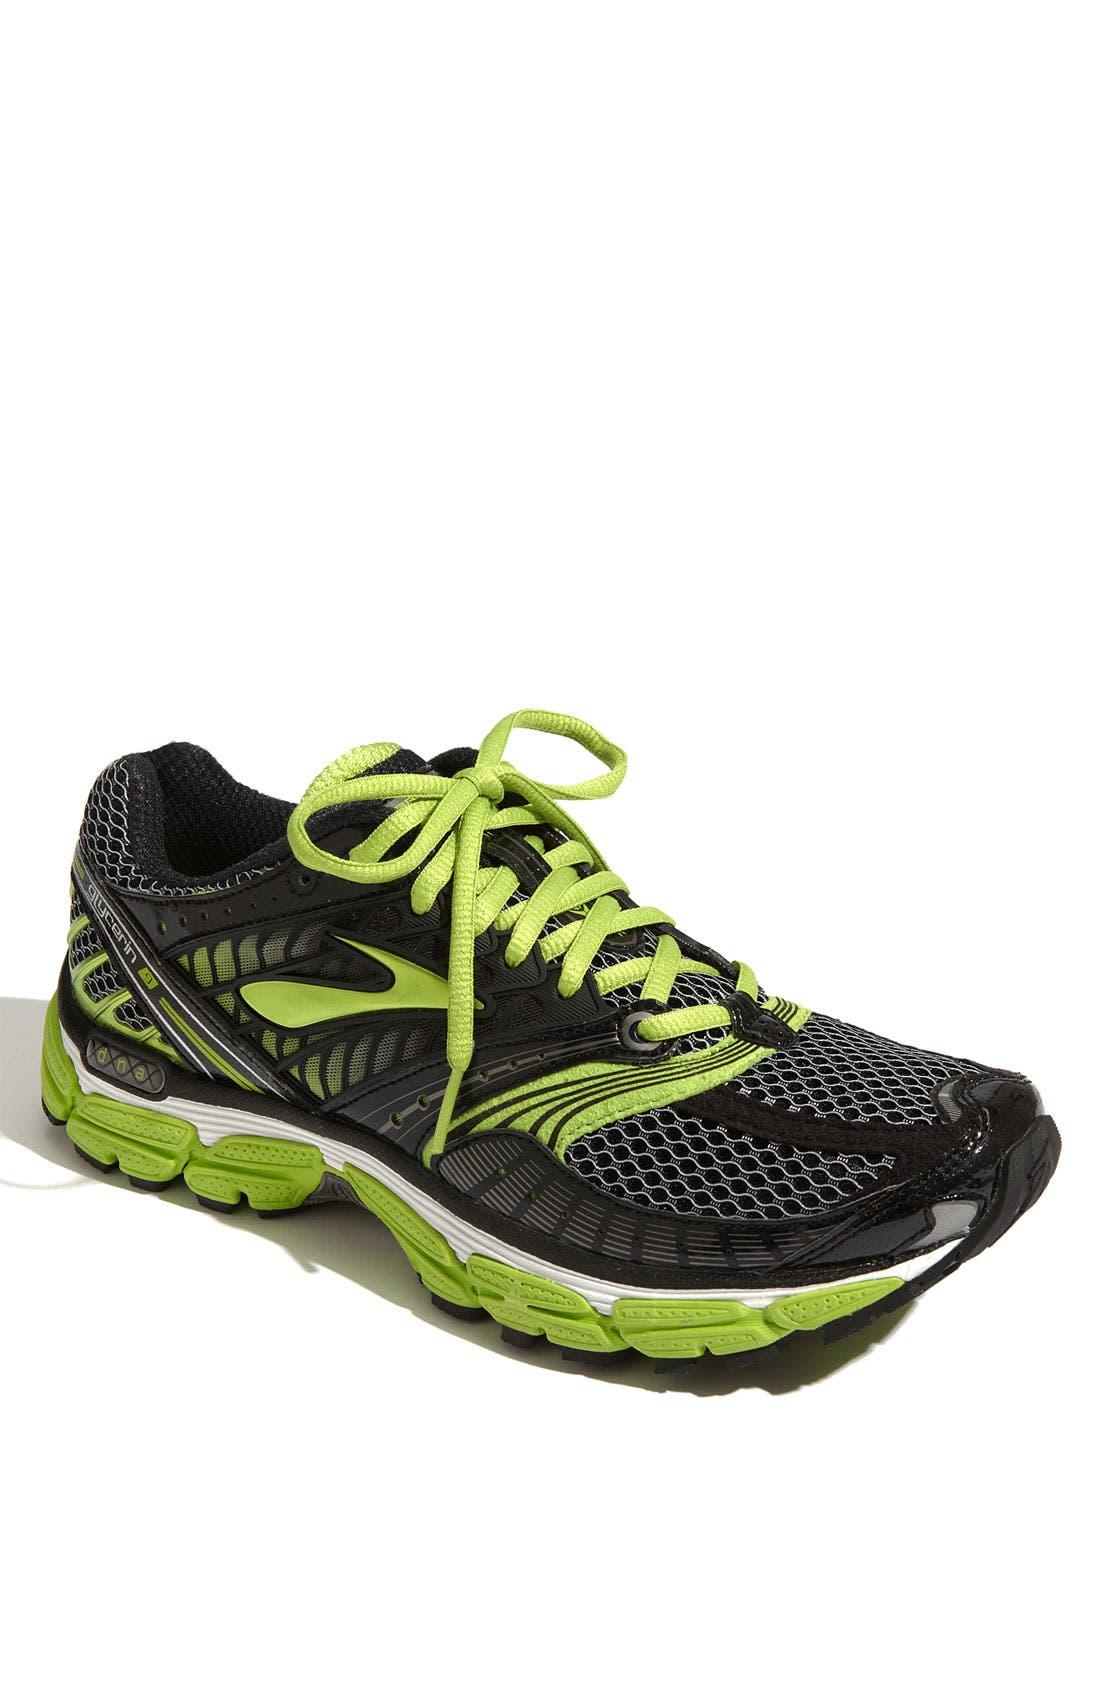 Main Image - Brooks 'Glycerin 9' Running Shoe (Men)